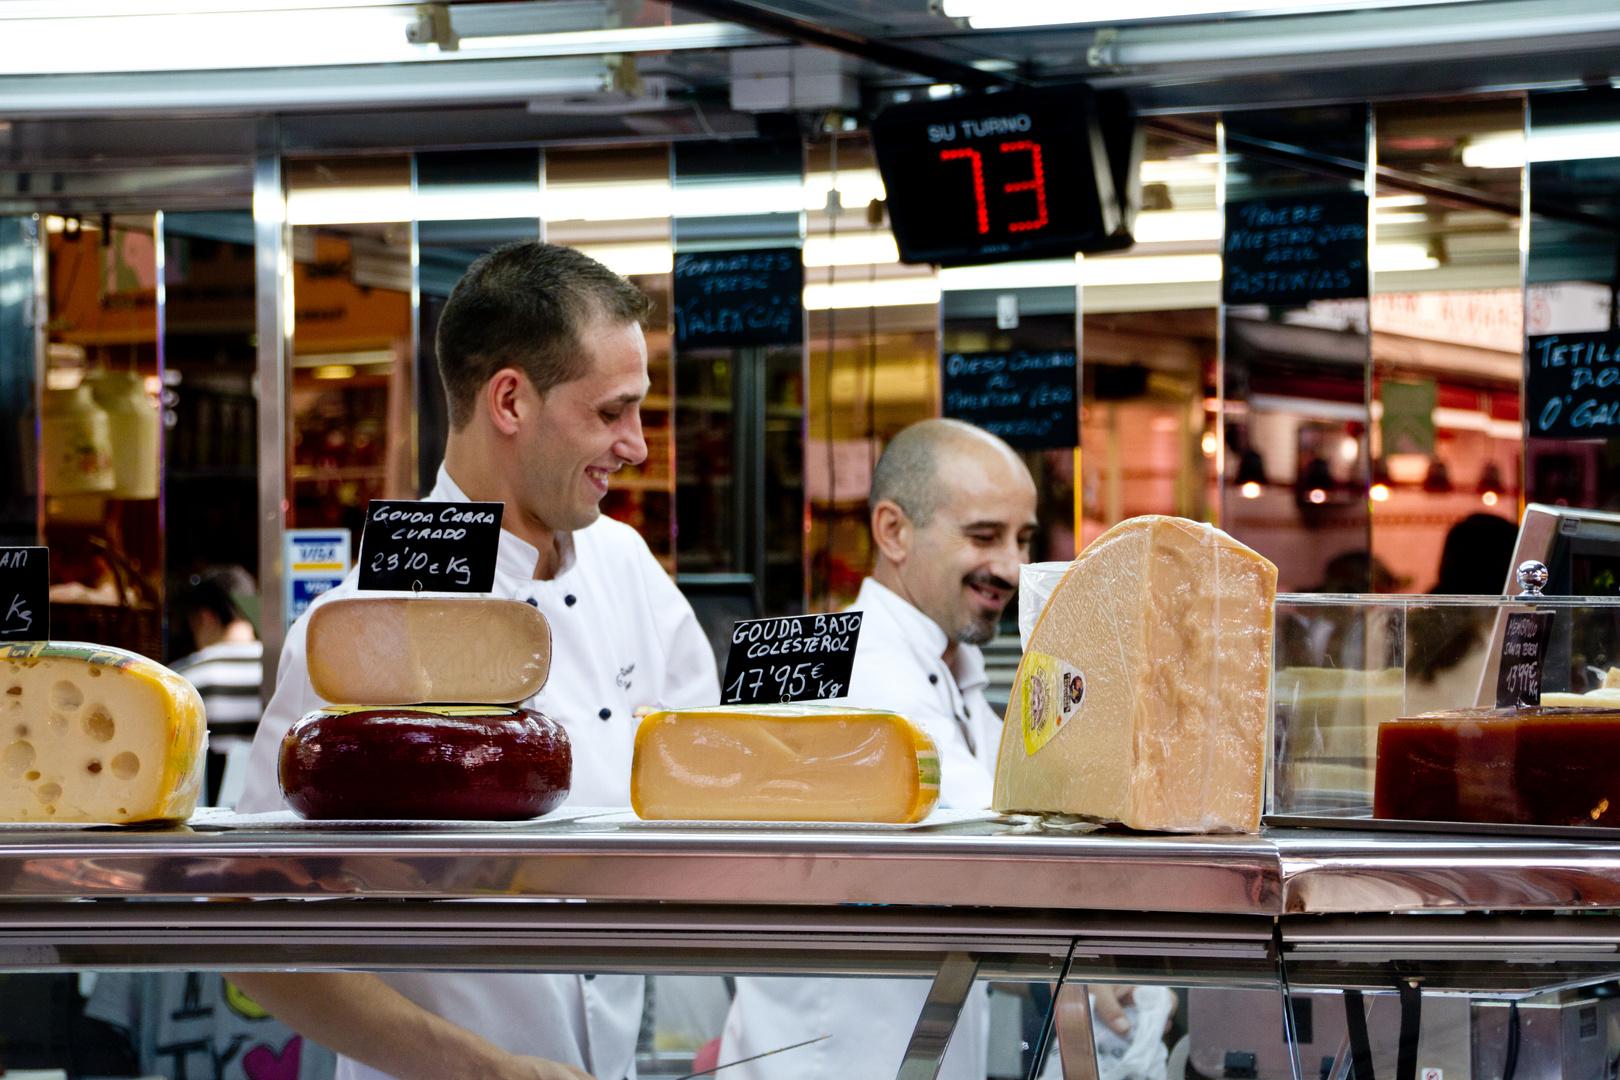 Das Lächeln der Käsehändler